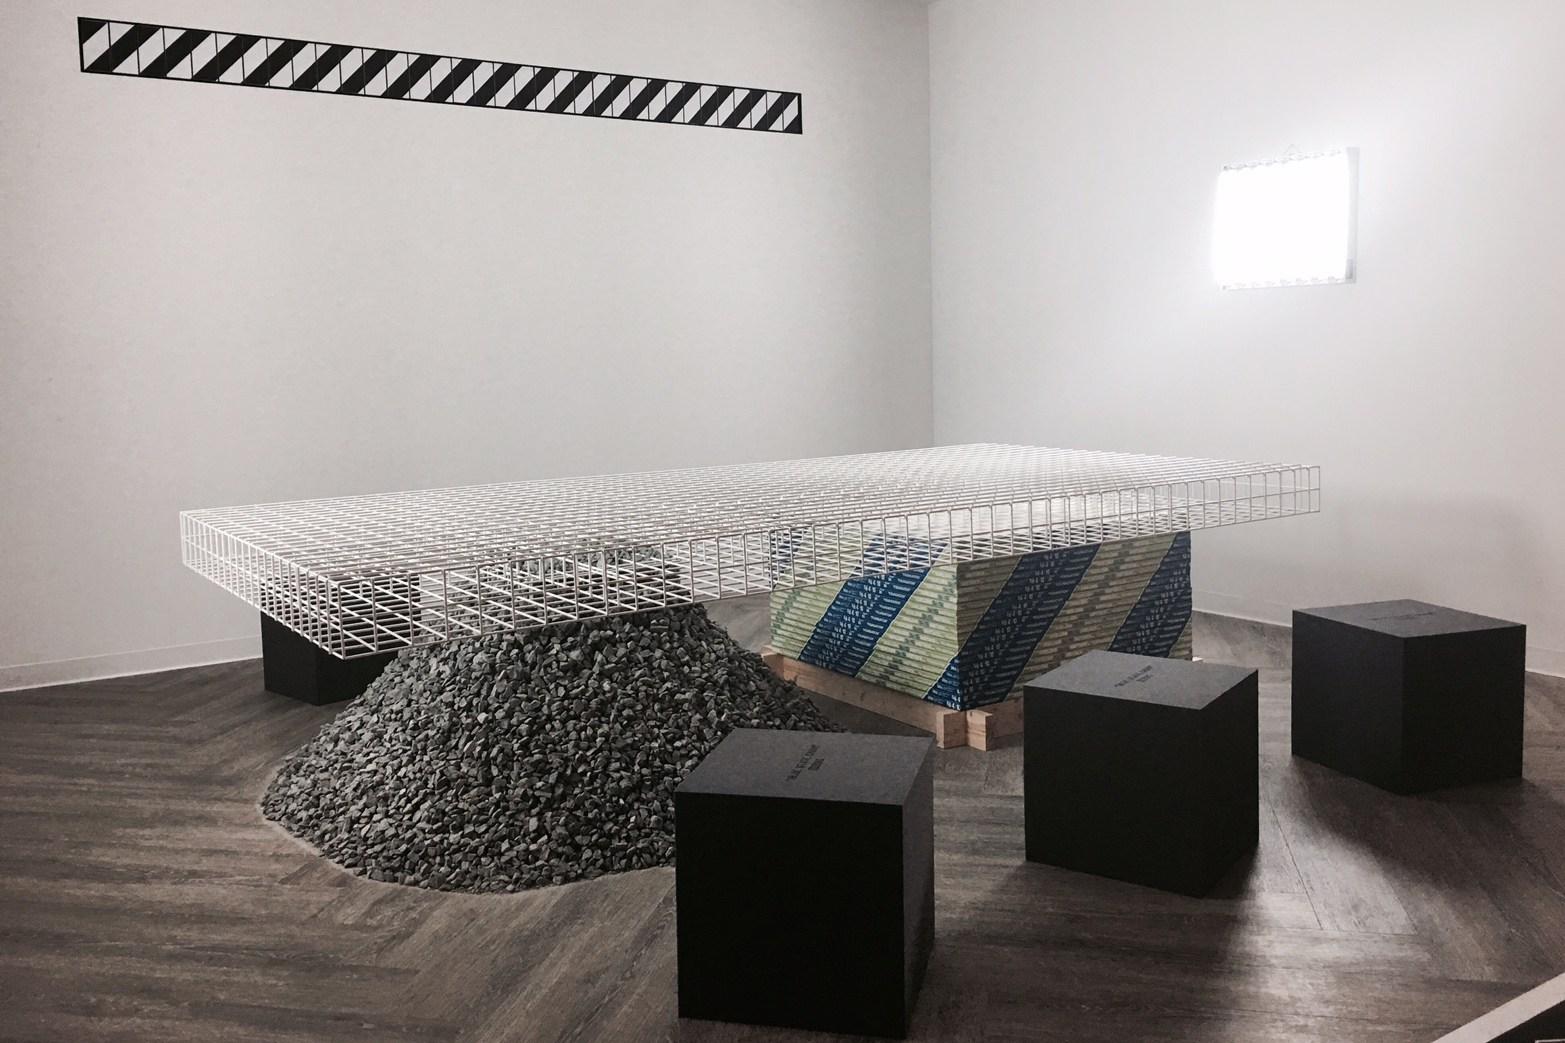 virgil-abloh-furniture-range-art-basel-miami-1